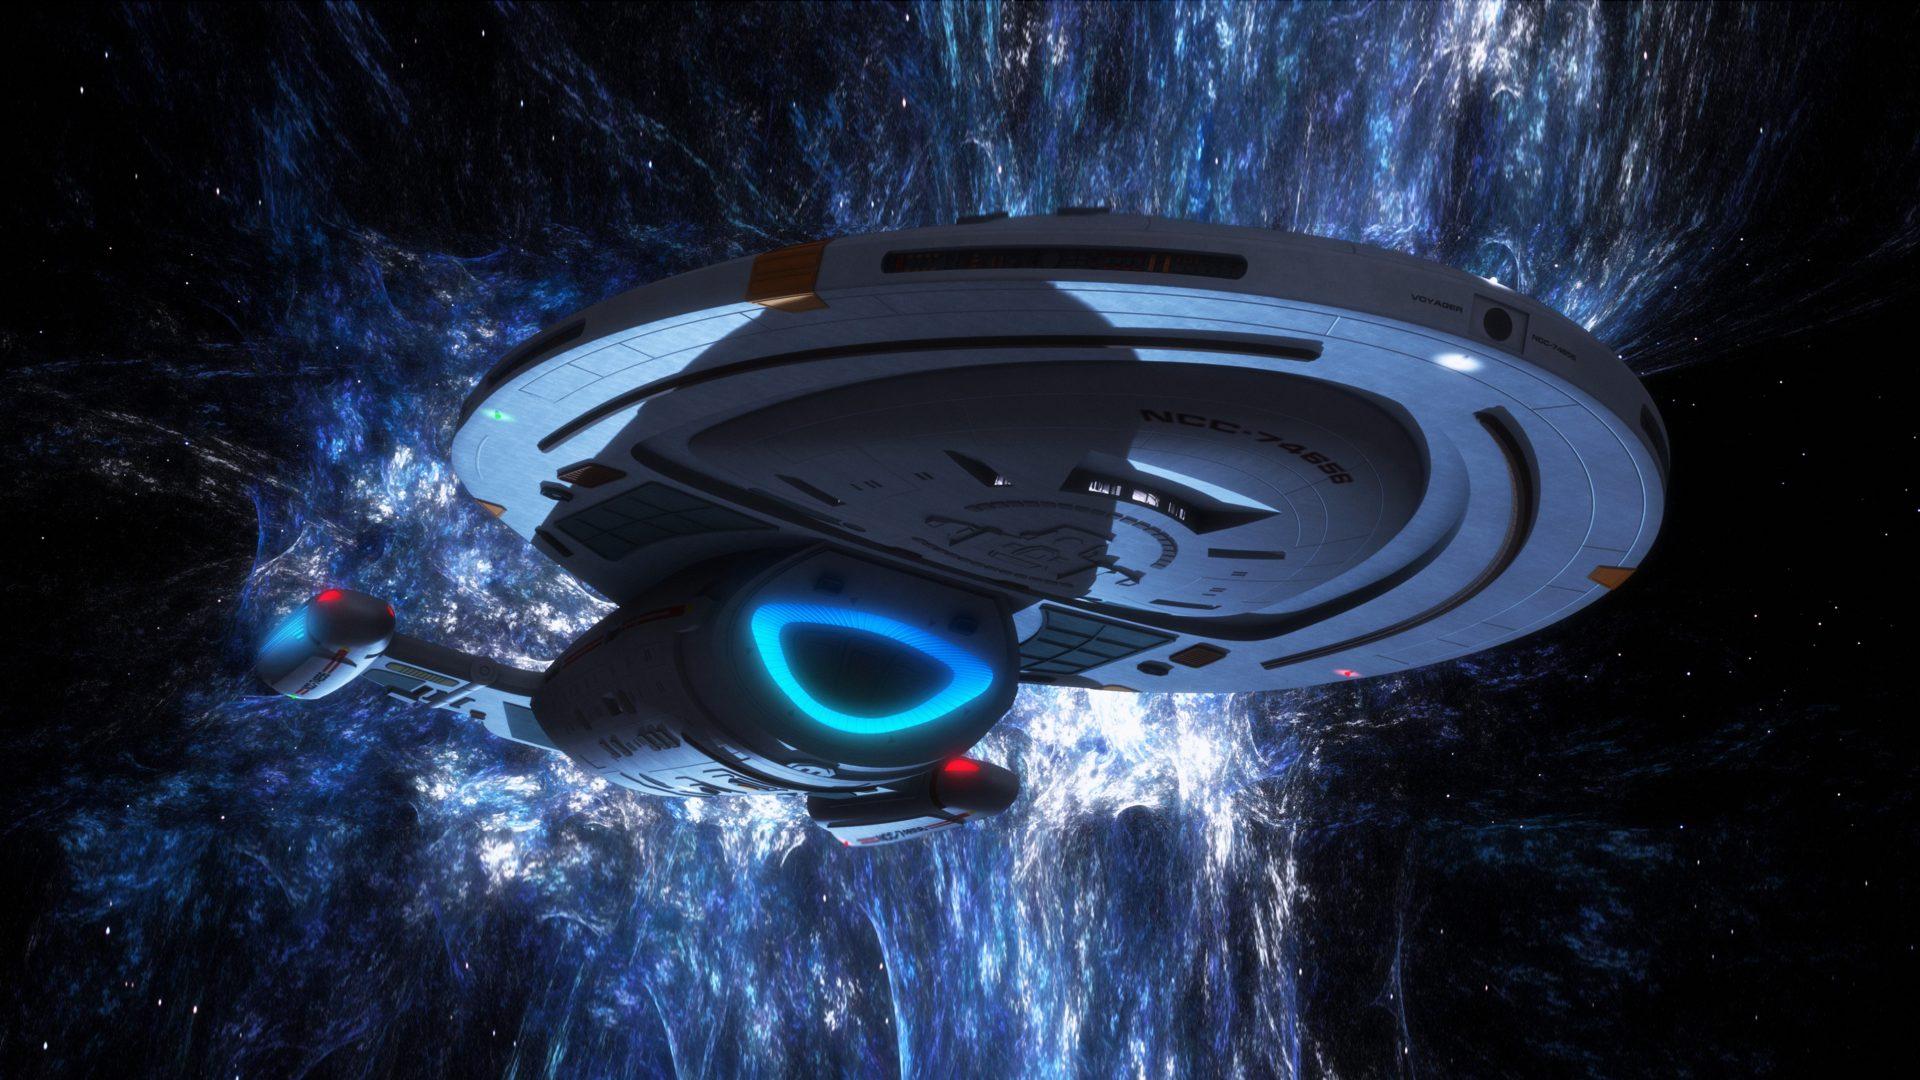 Star Trek Voyager Spaceship Digital Art Hd Wallpapers For 1920x1080